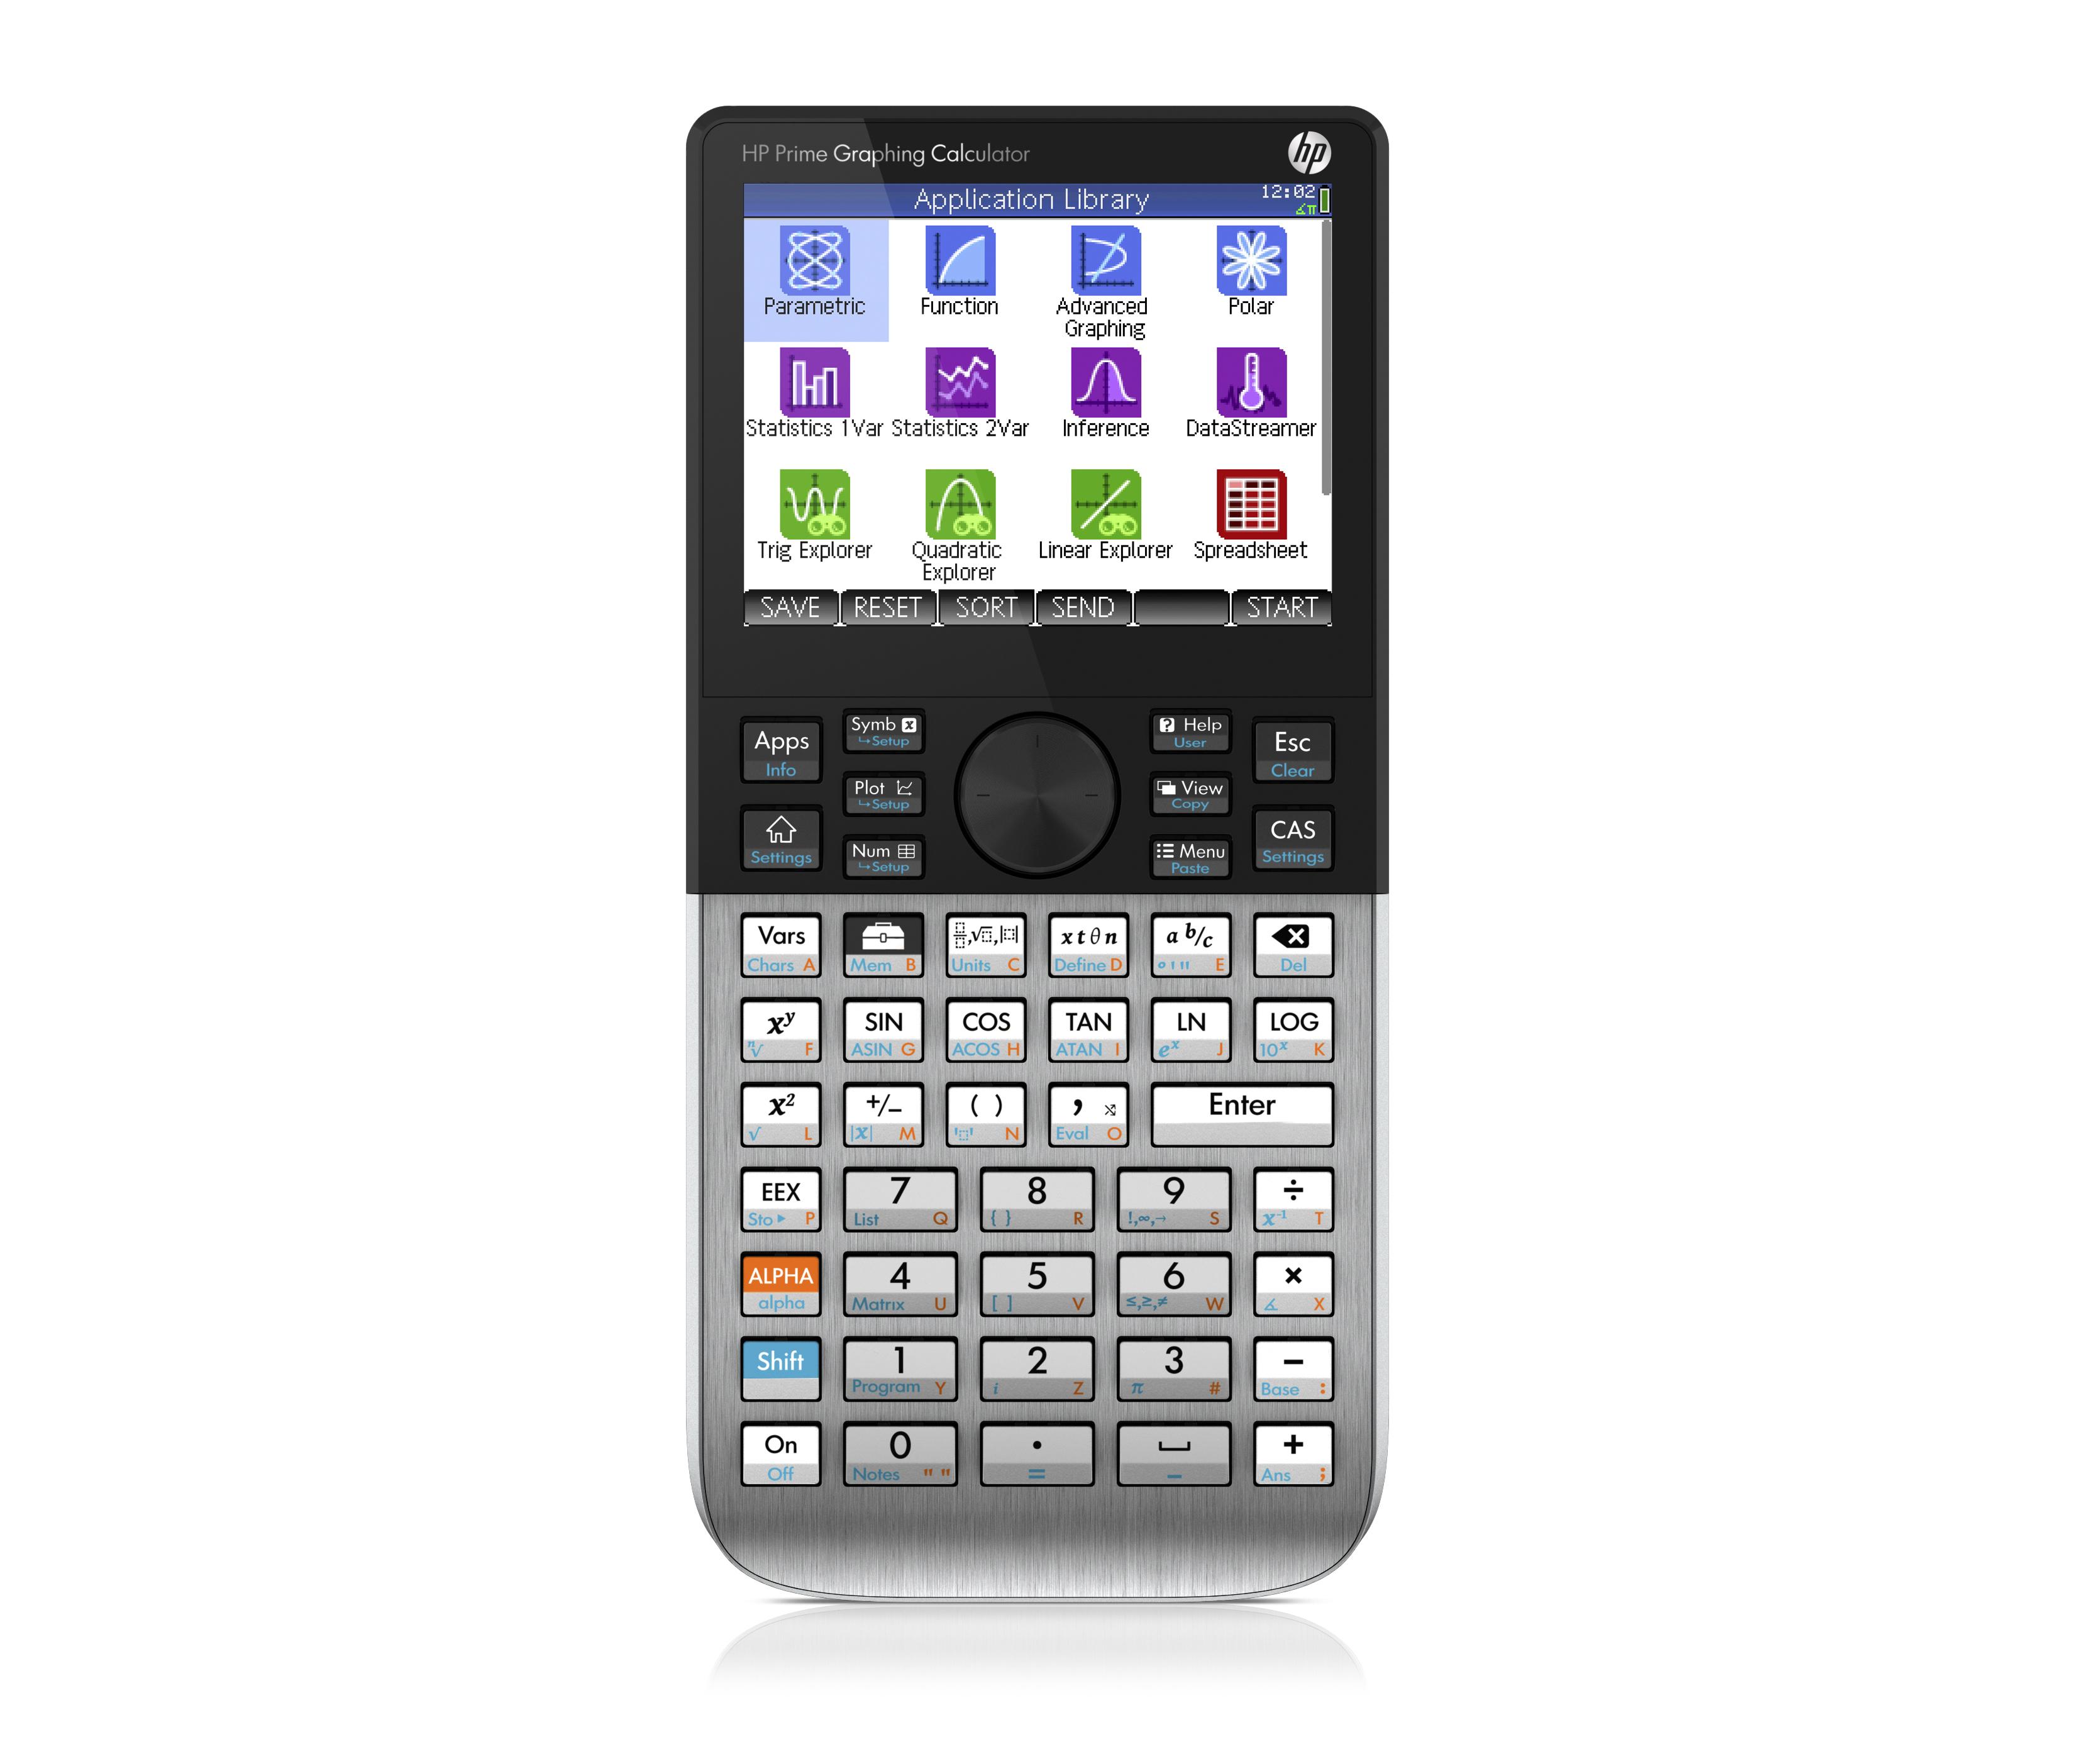 Hp prime la primera calculadora gr fica a color y t ctil for Calculadora de redes